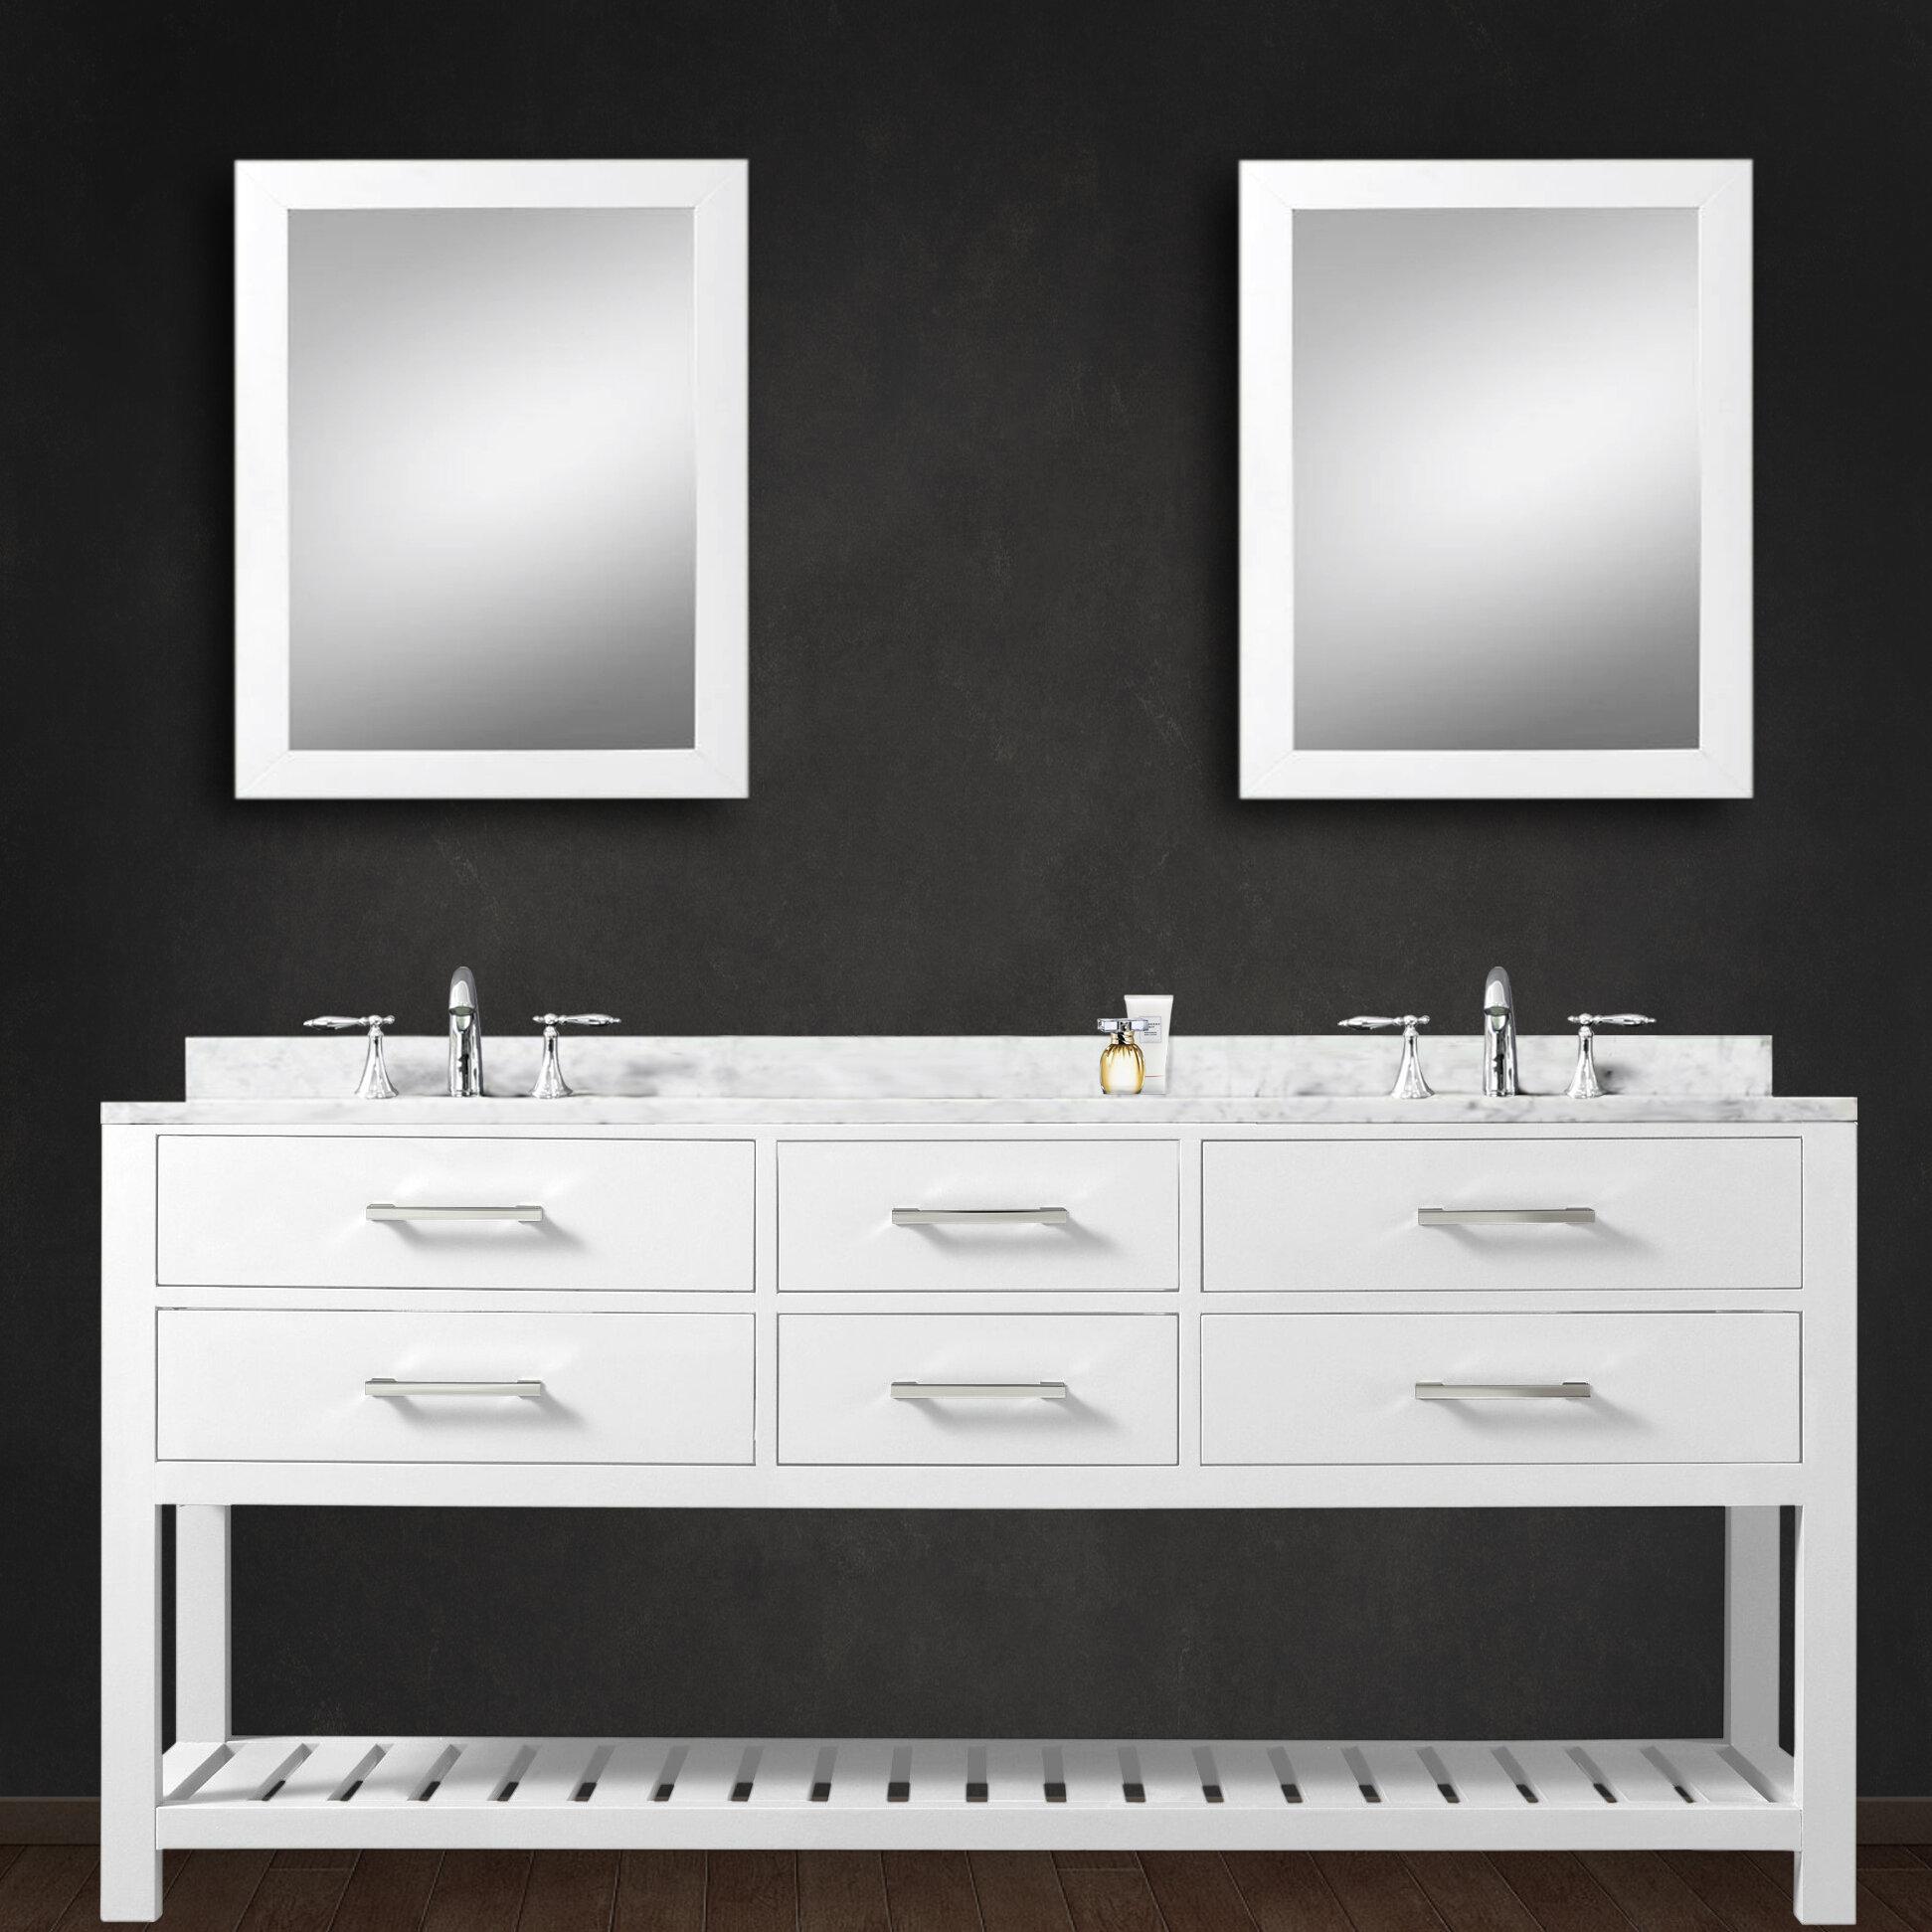 Contemporary Office Interior Design, Perego 60 Double Sink Bathroom Vanity Set With Mirror Reviews Allmodern